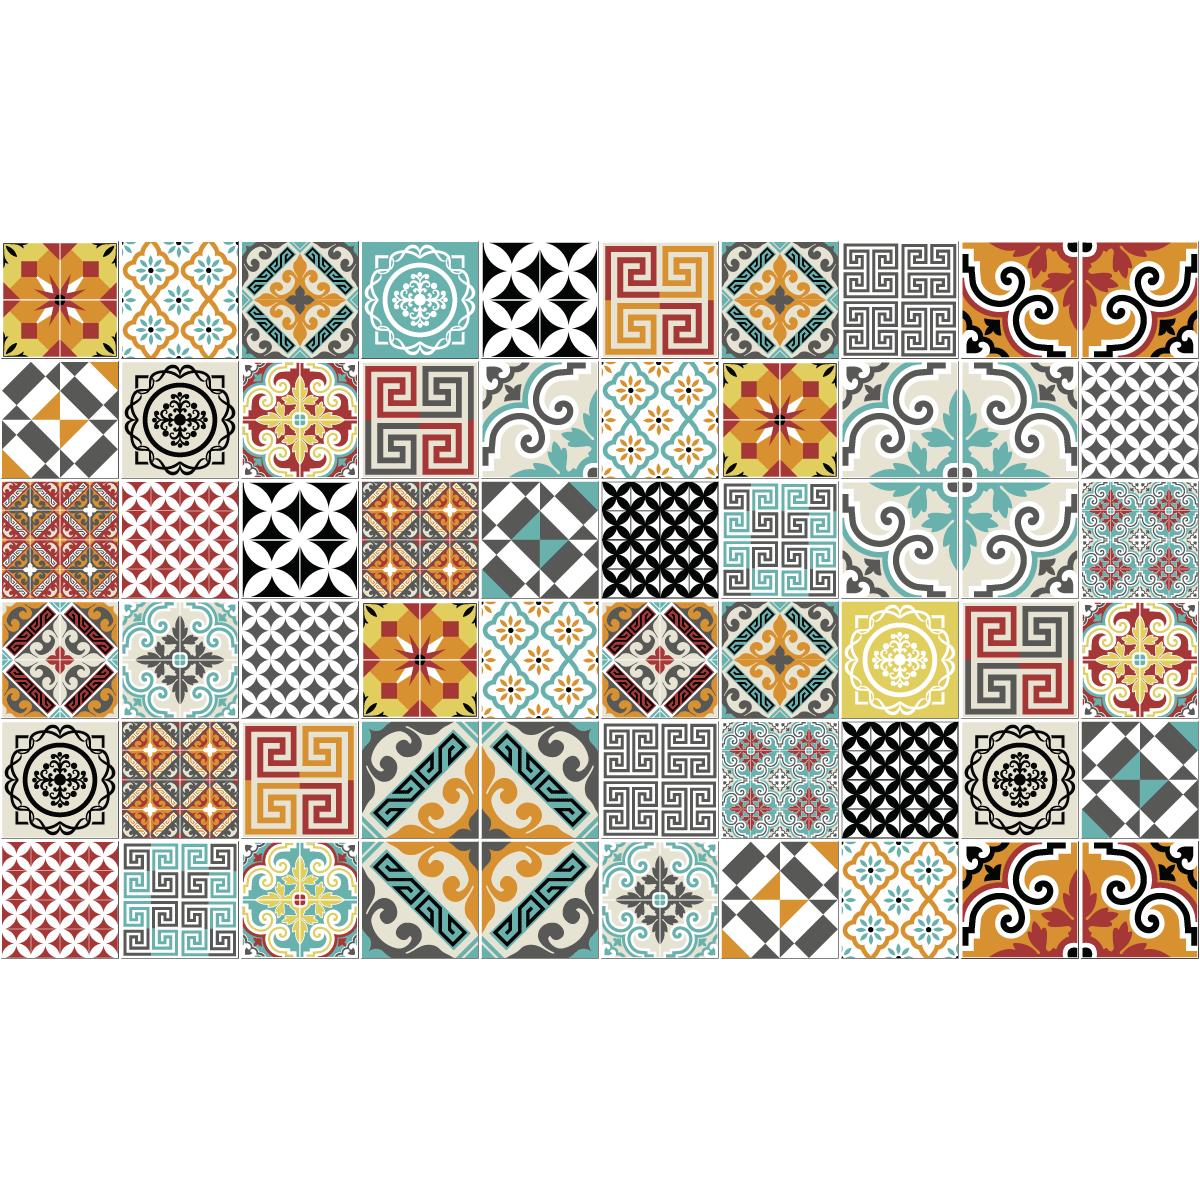 60 stickers carrelages azulejos batista cuisine carrelages ambiance sticker. Black Bedroom Furniture Sets. Home Design Ideas